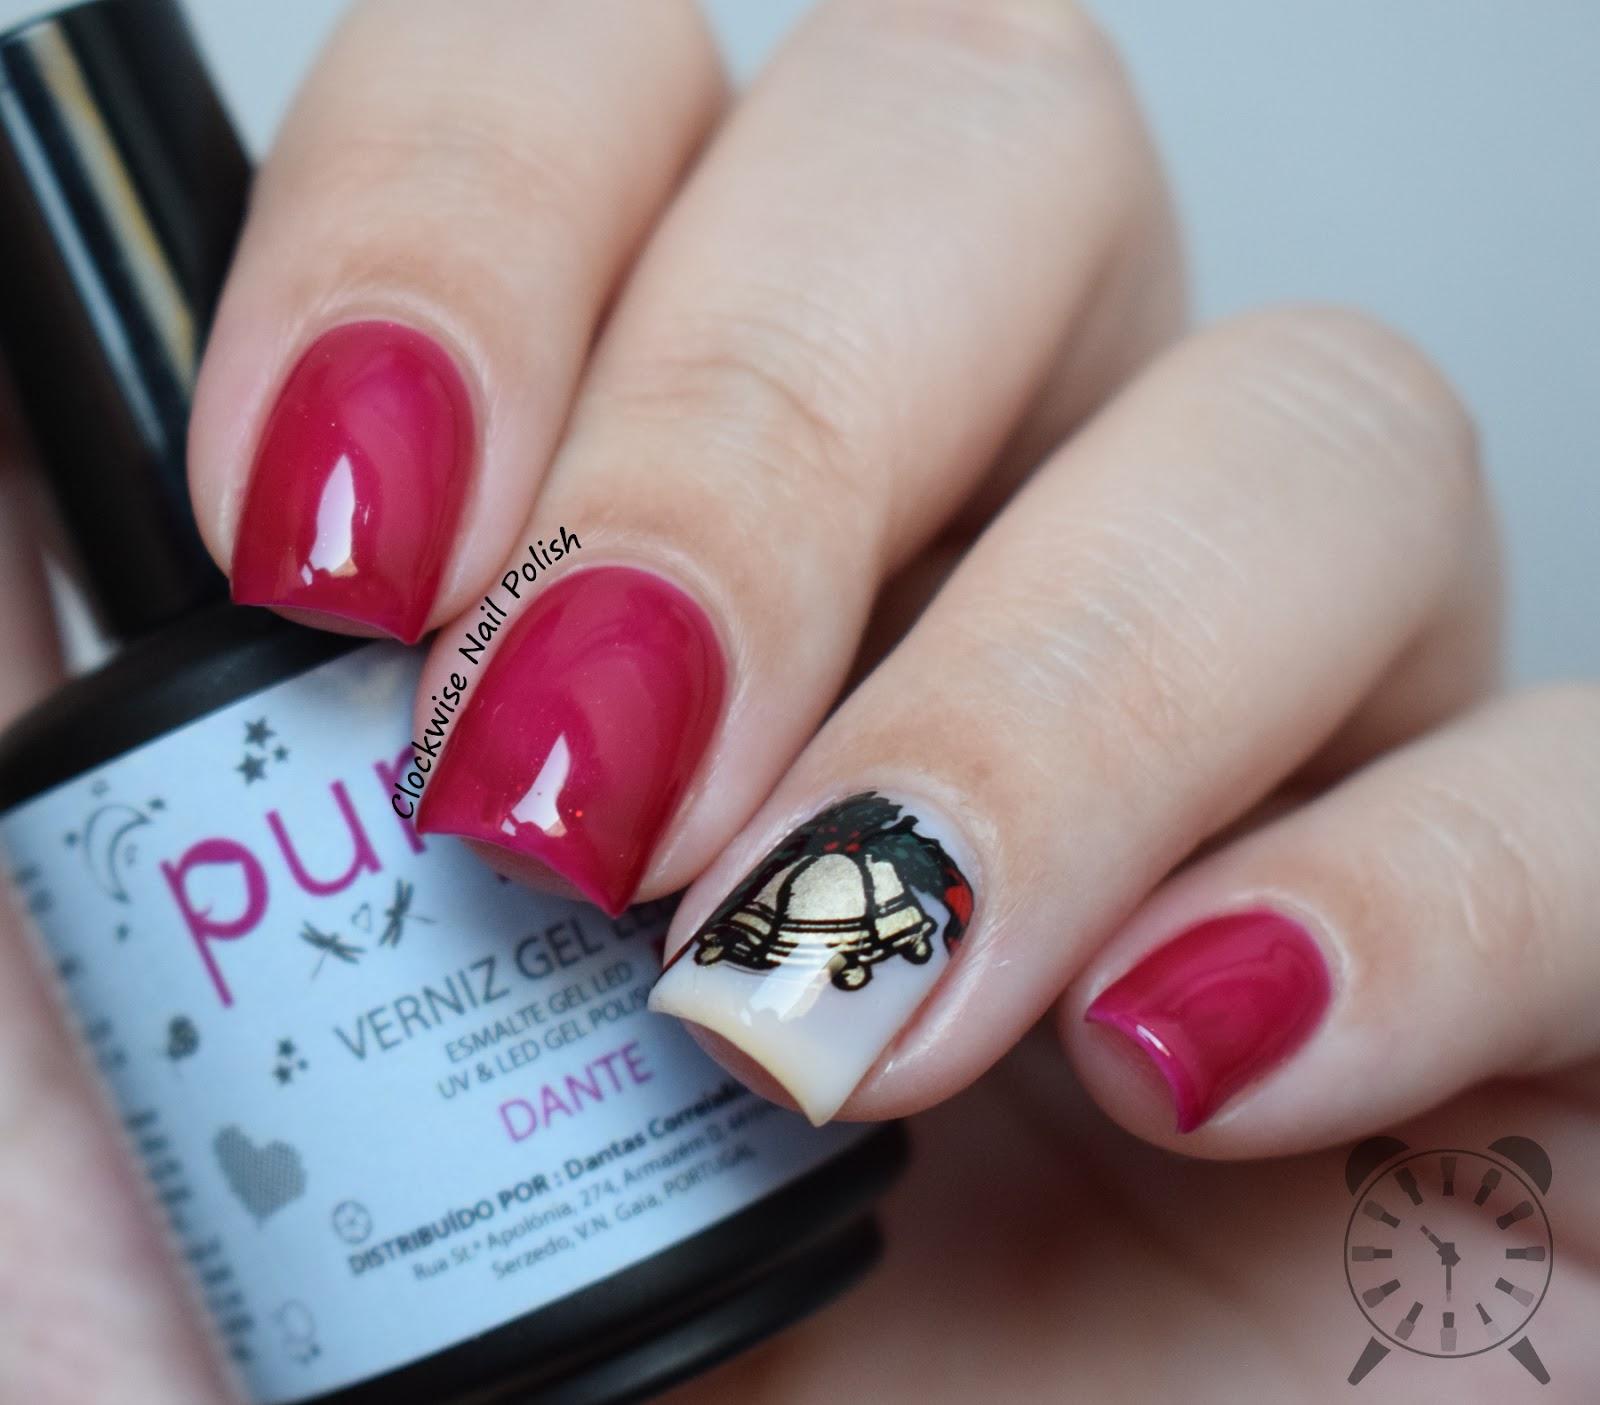 The Clockwise Nail Polish: Purple Professional Tegan & Dante Gel ...